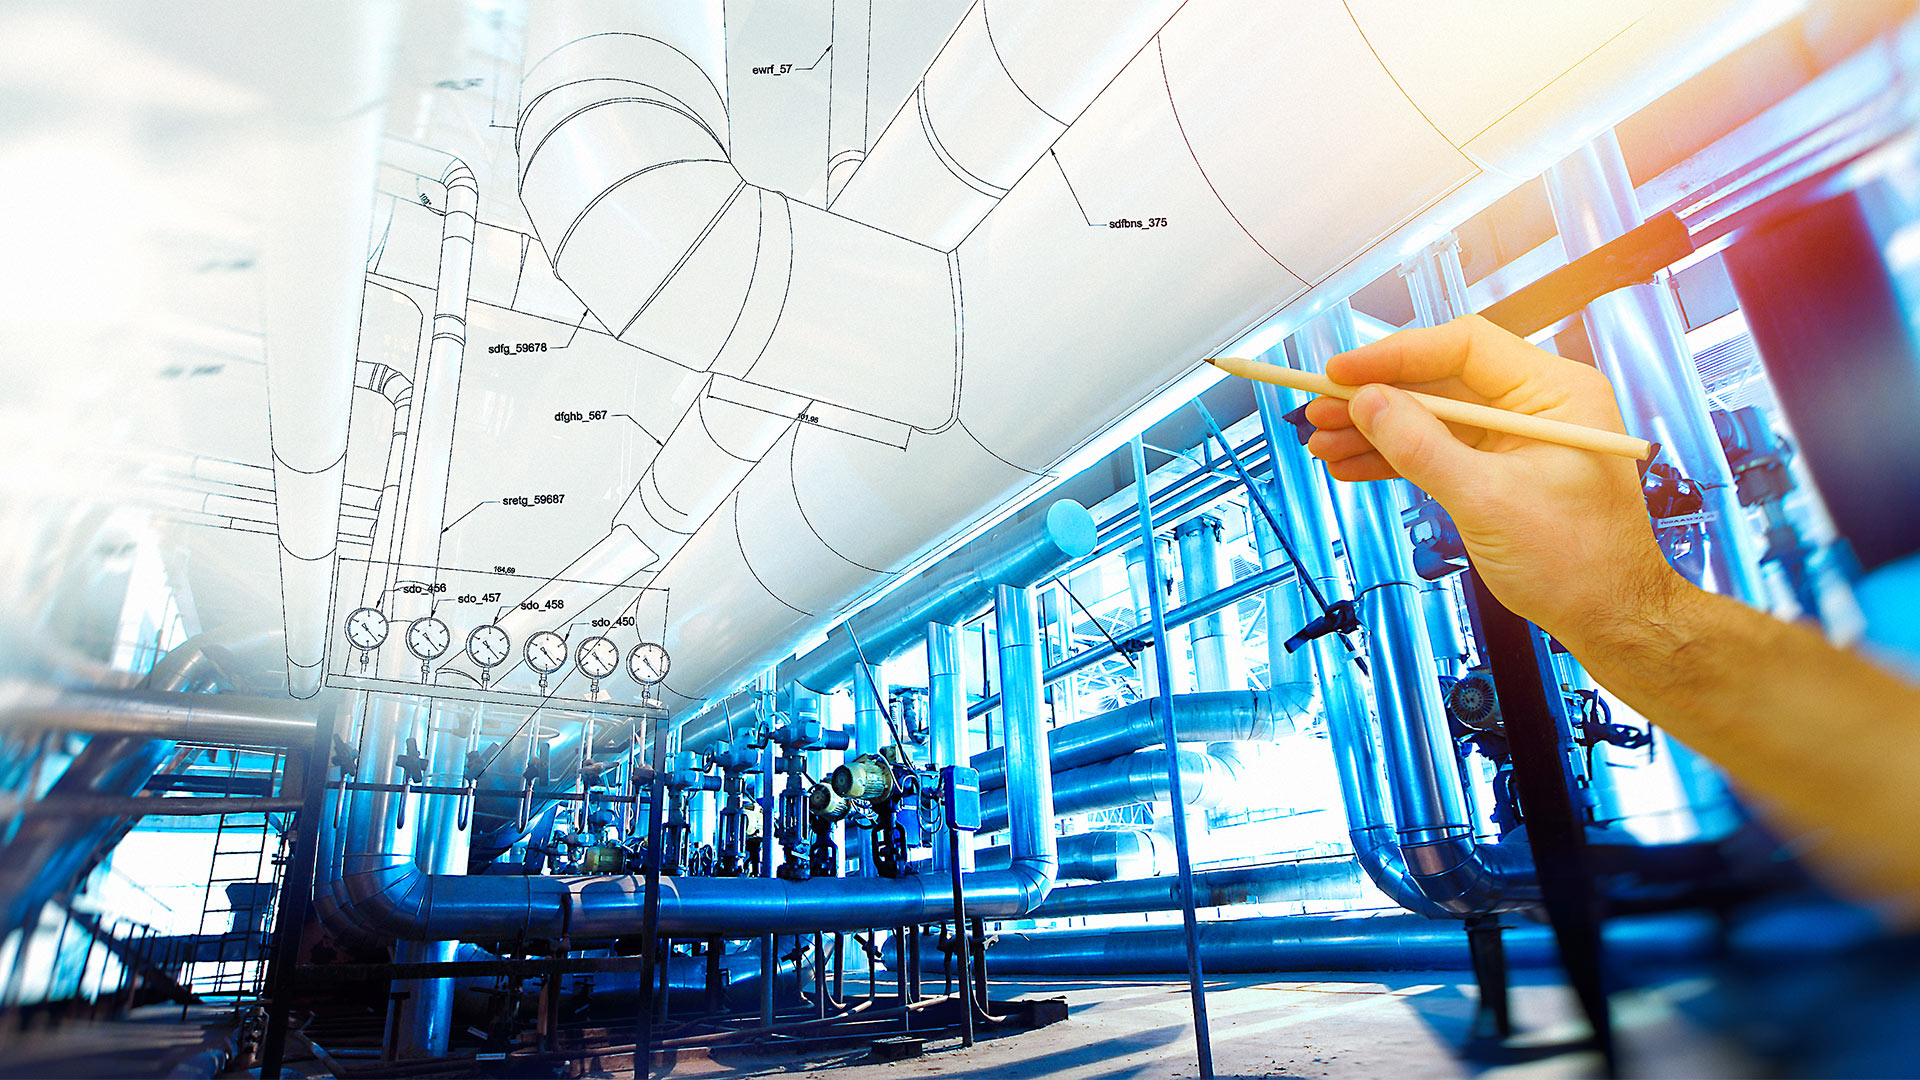 Mechanical Insulators LMCT - Apprenticeship Training - US Department of Labor National Apprenticeship Week